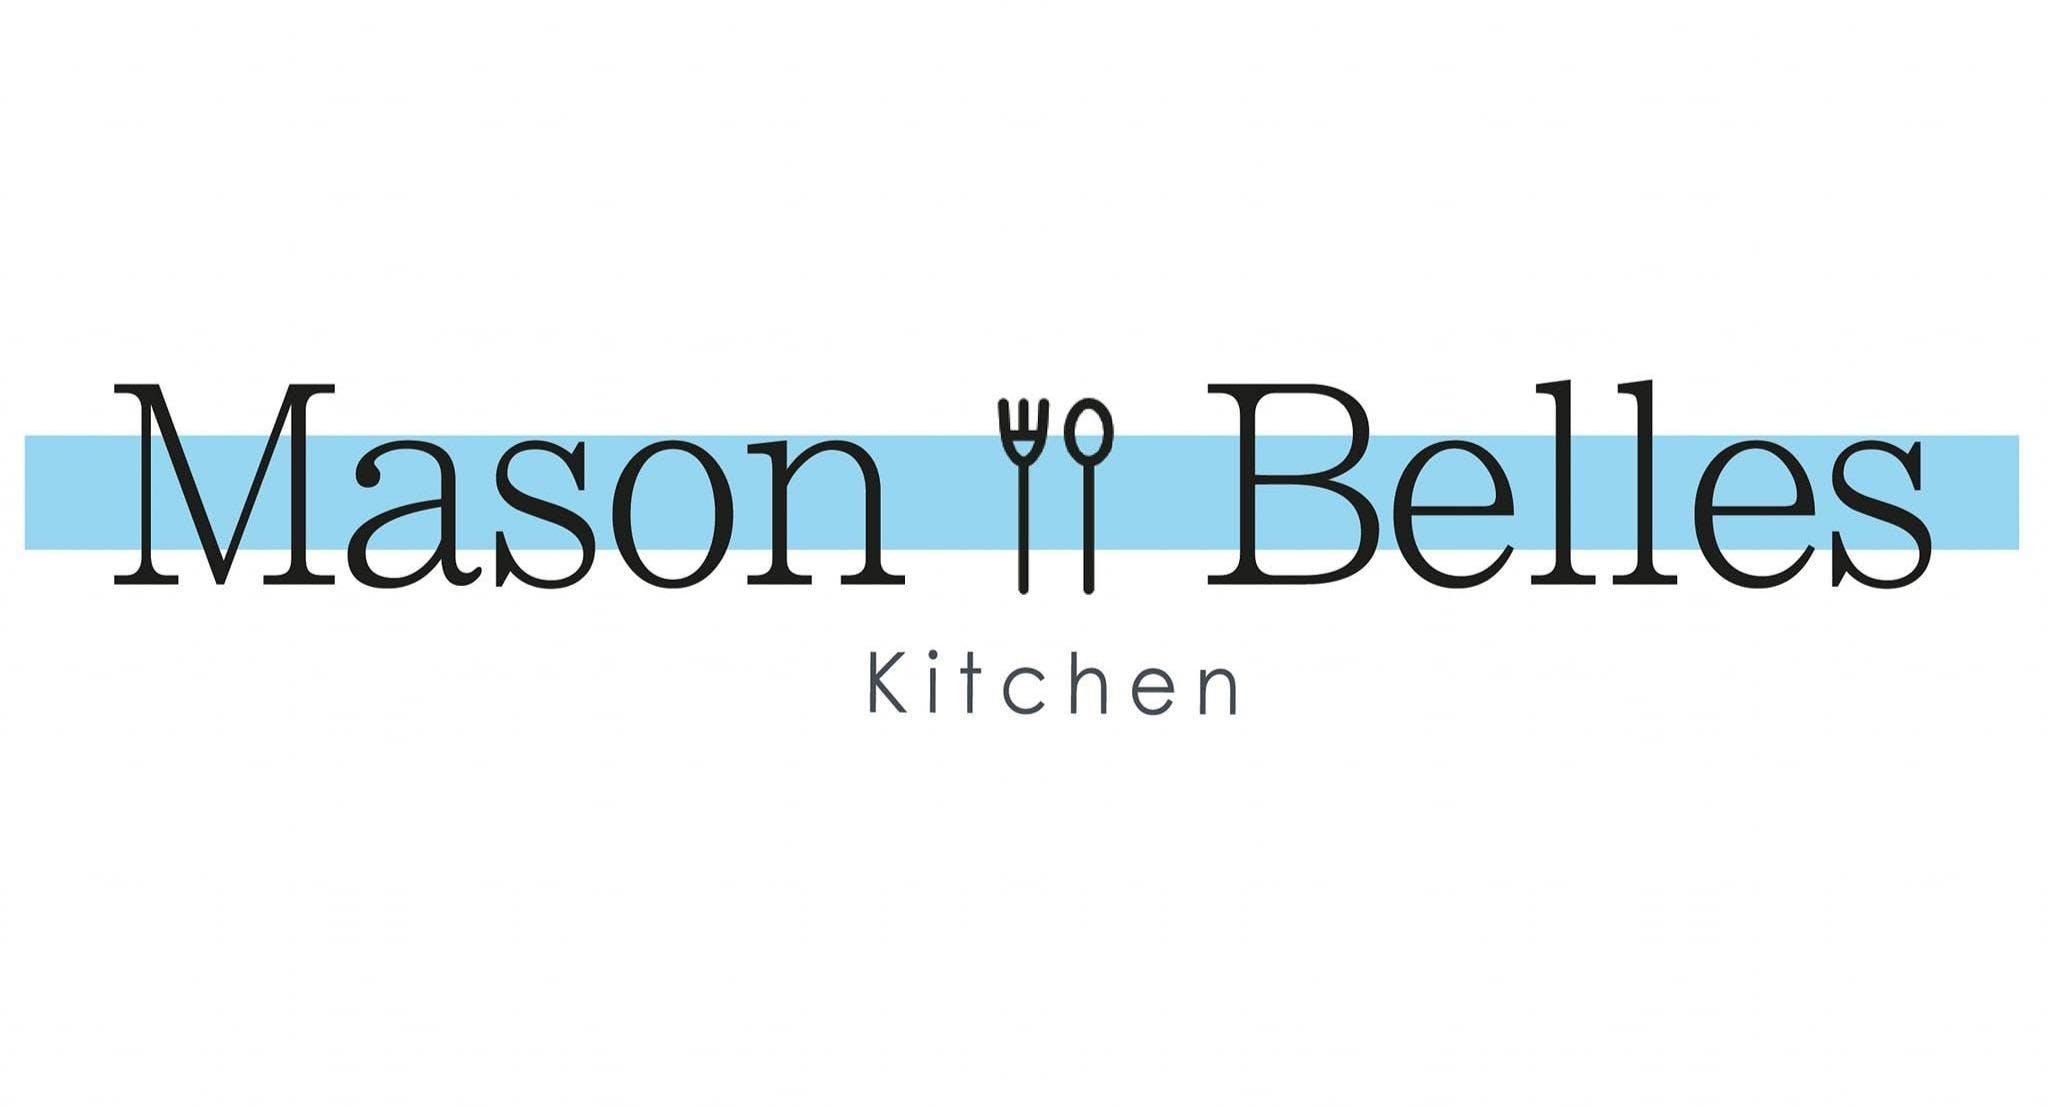 Mason Belles Kitchen